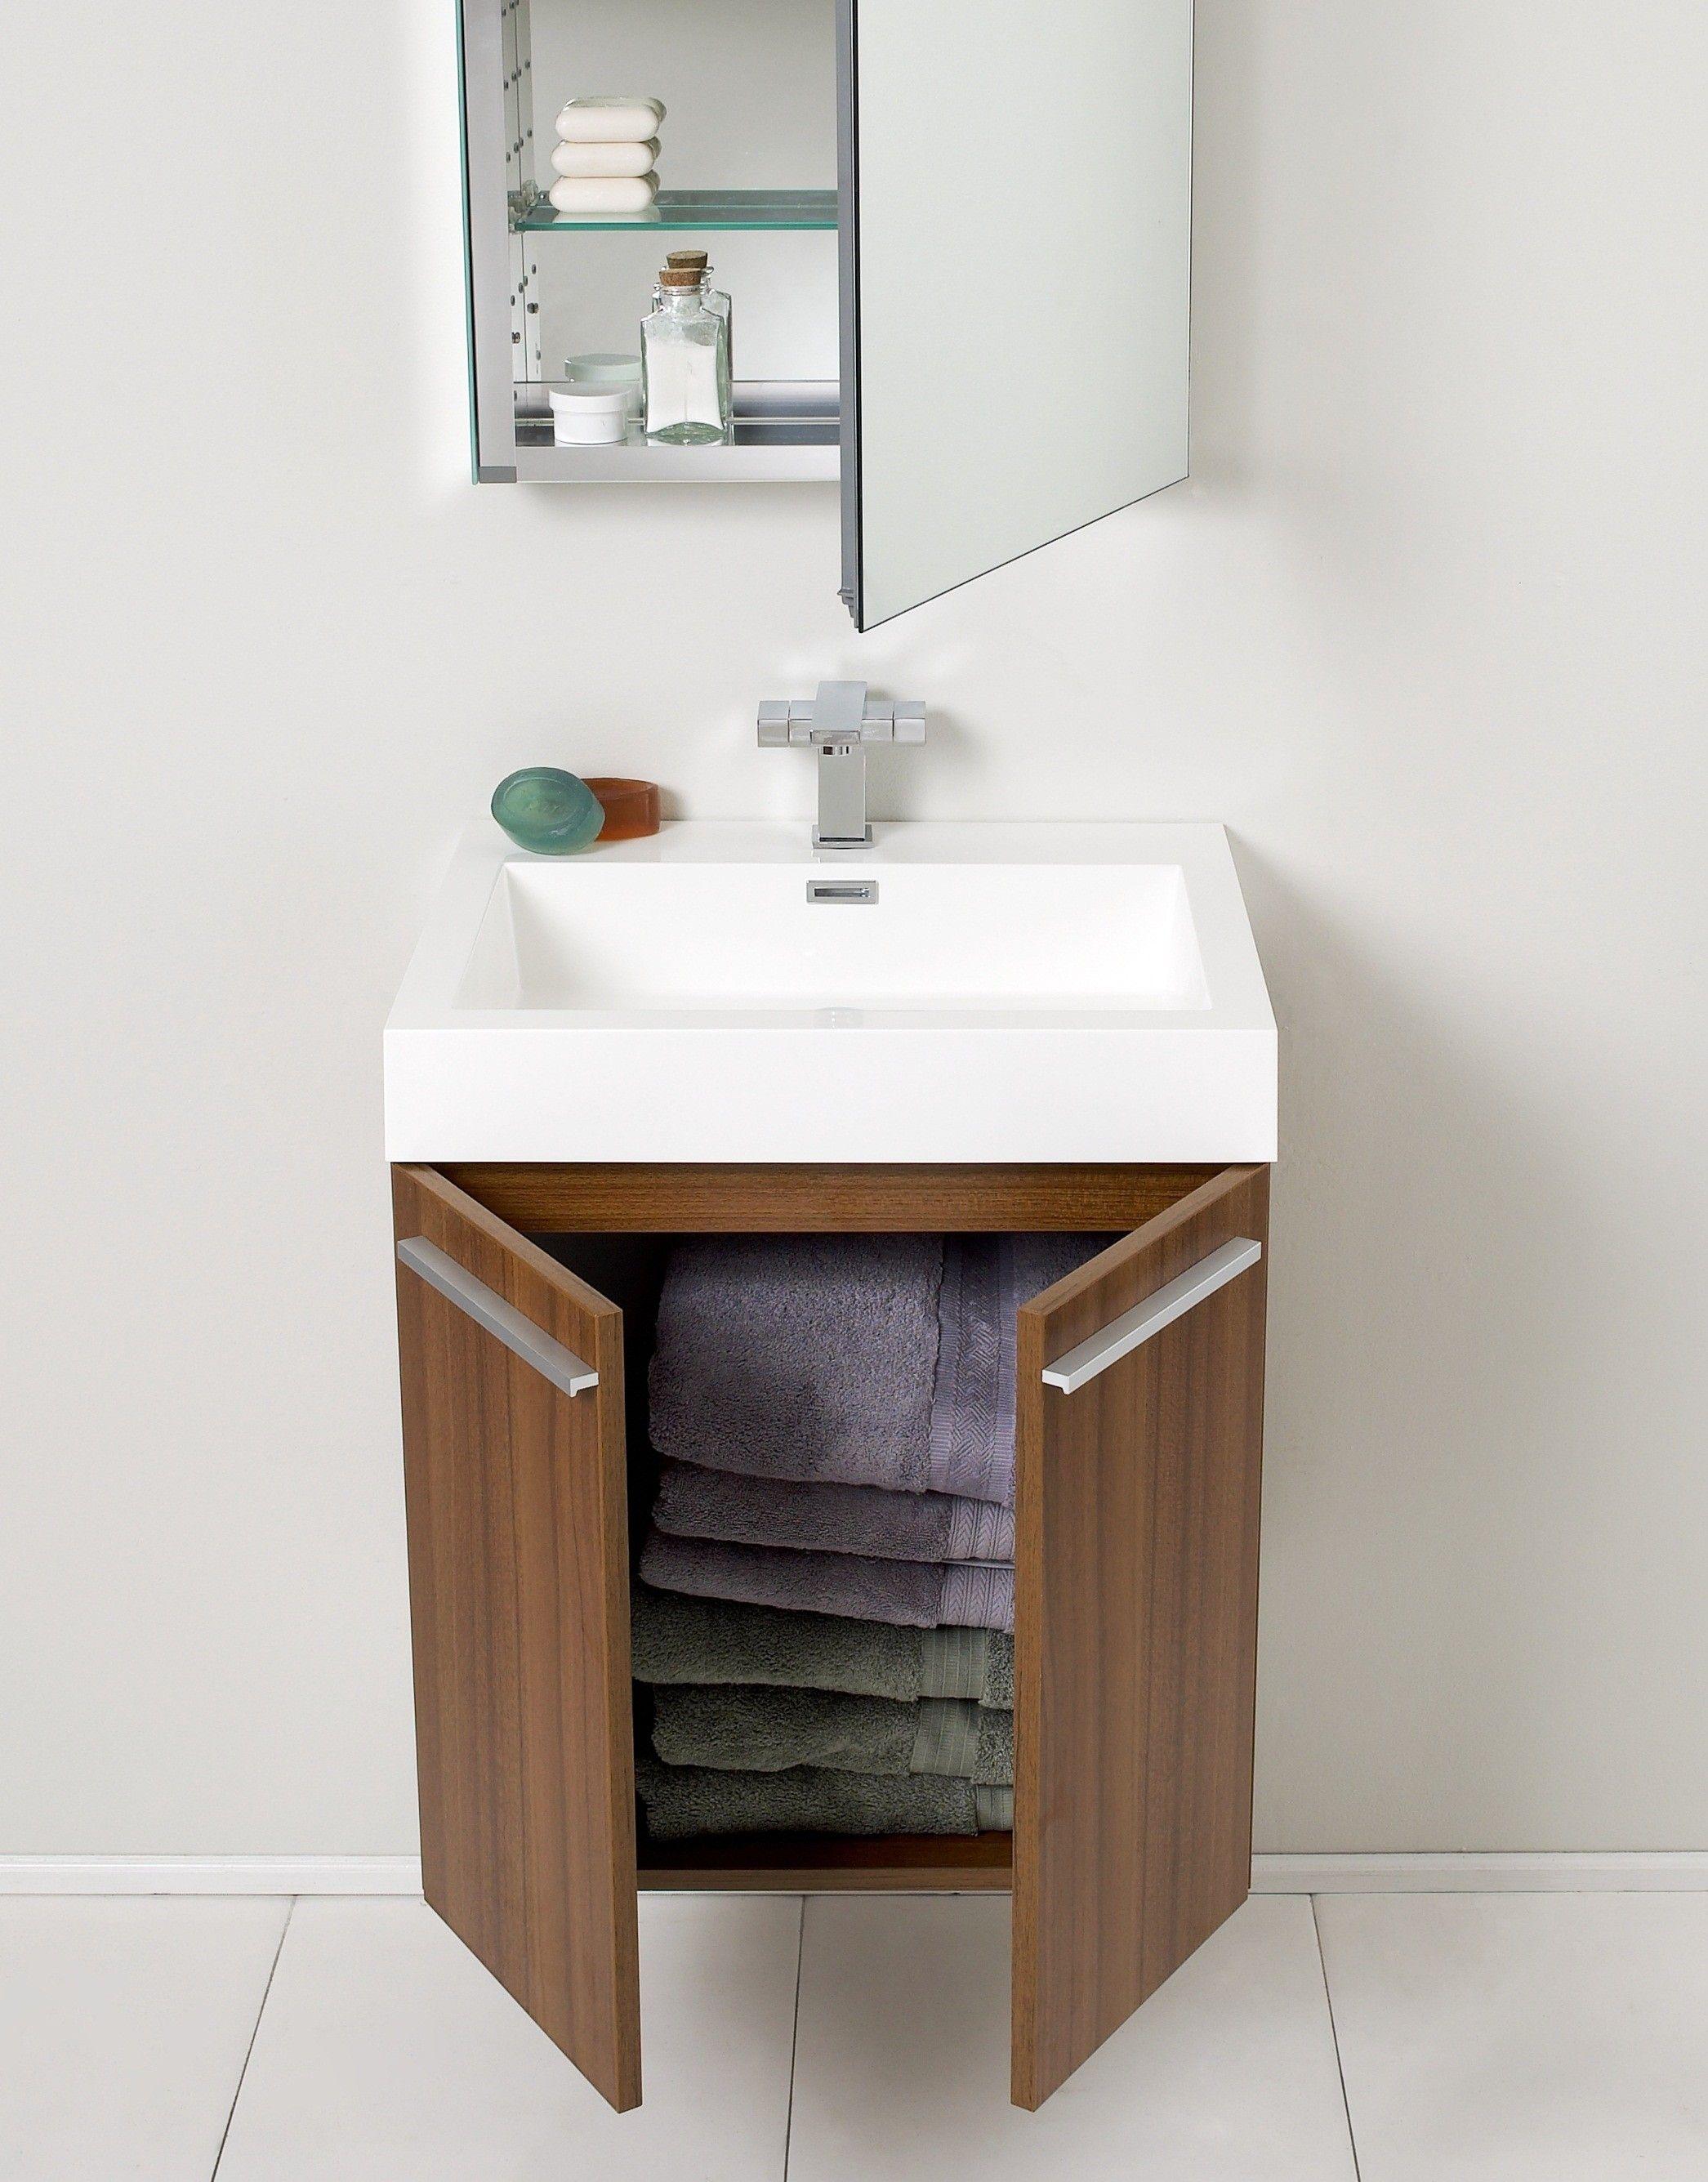 30 Amazing Bathroom Chandeliers For Your Home Bathroom Interior Ideas Innovative Conte Small Bathroom Sinks Small Bathroom Vanities Home Depot Bathroom Vanity [ 2671 x 2091 Pixel ]